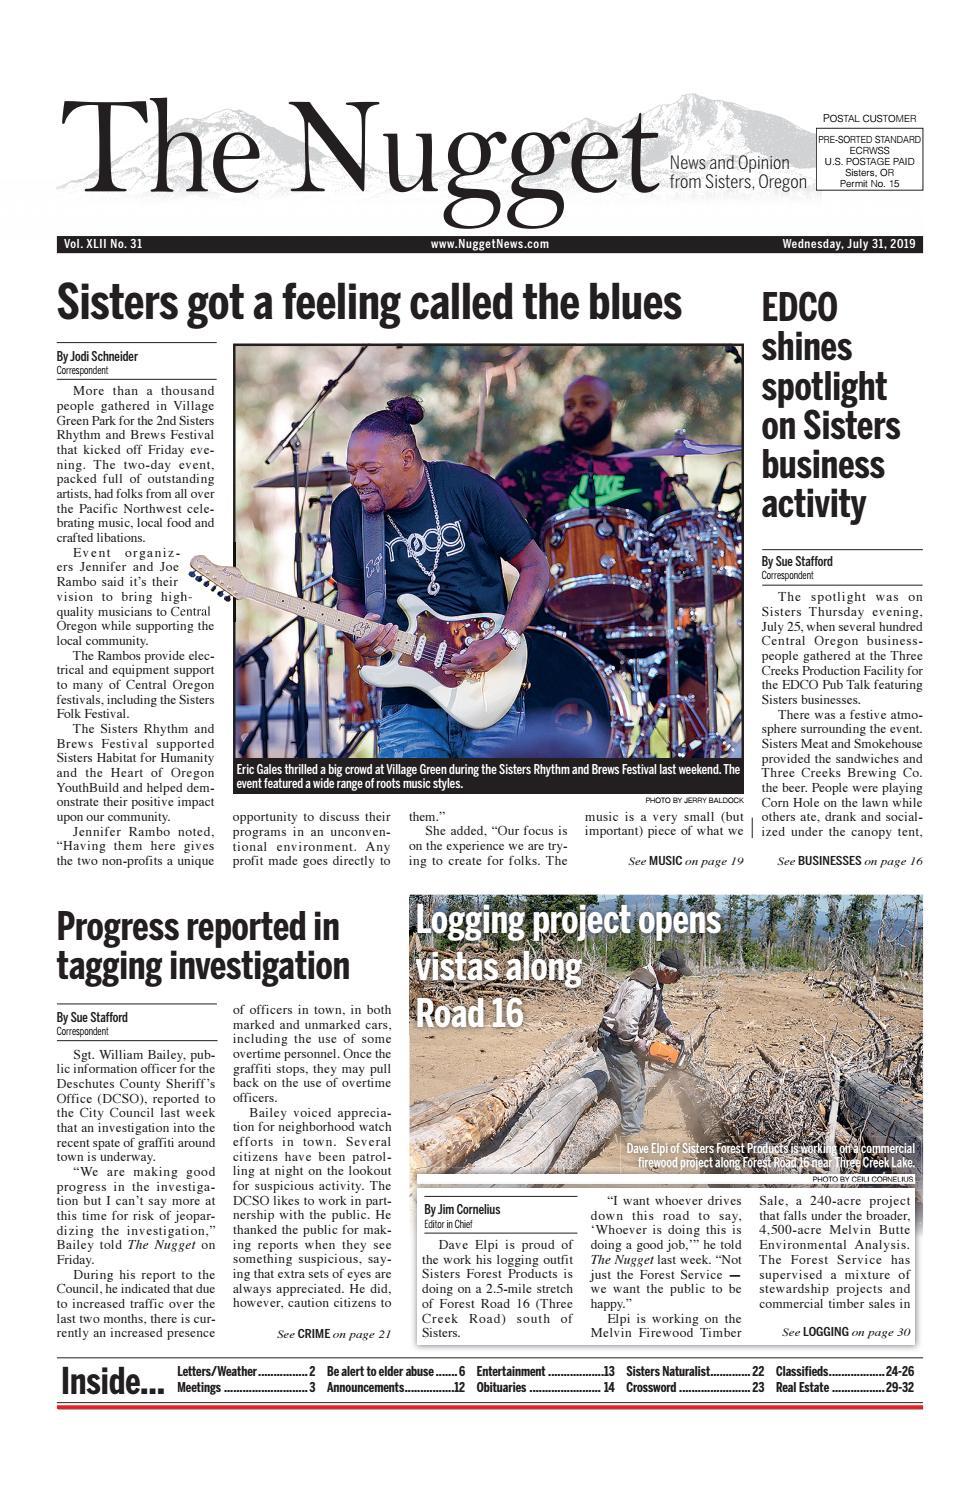 The Nugget Newspaper // Vol  XLII No  31 // 2019-07-31 by